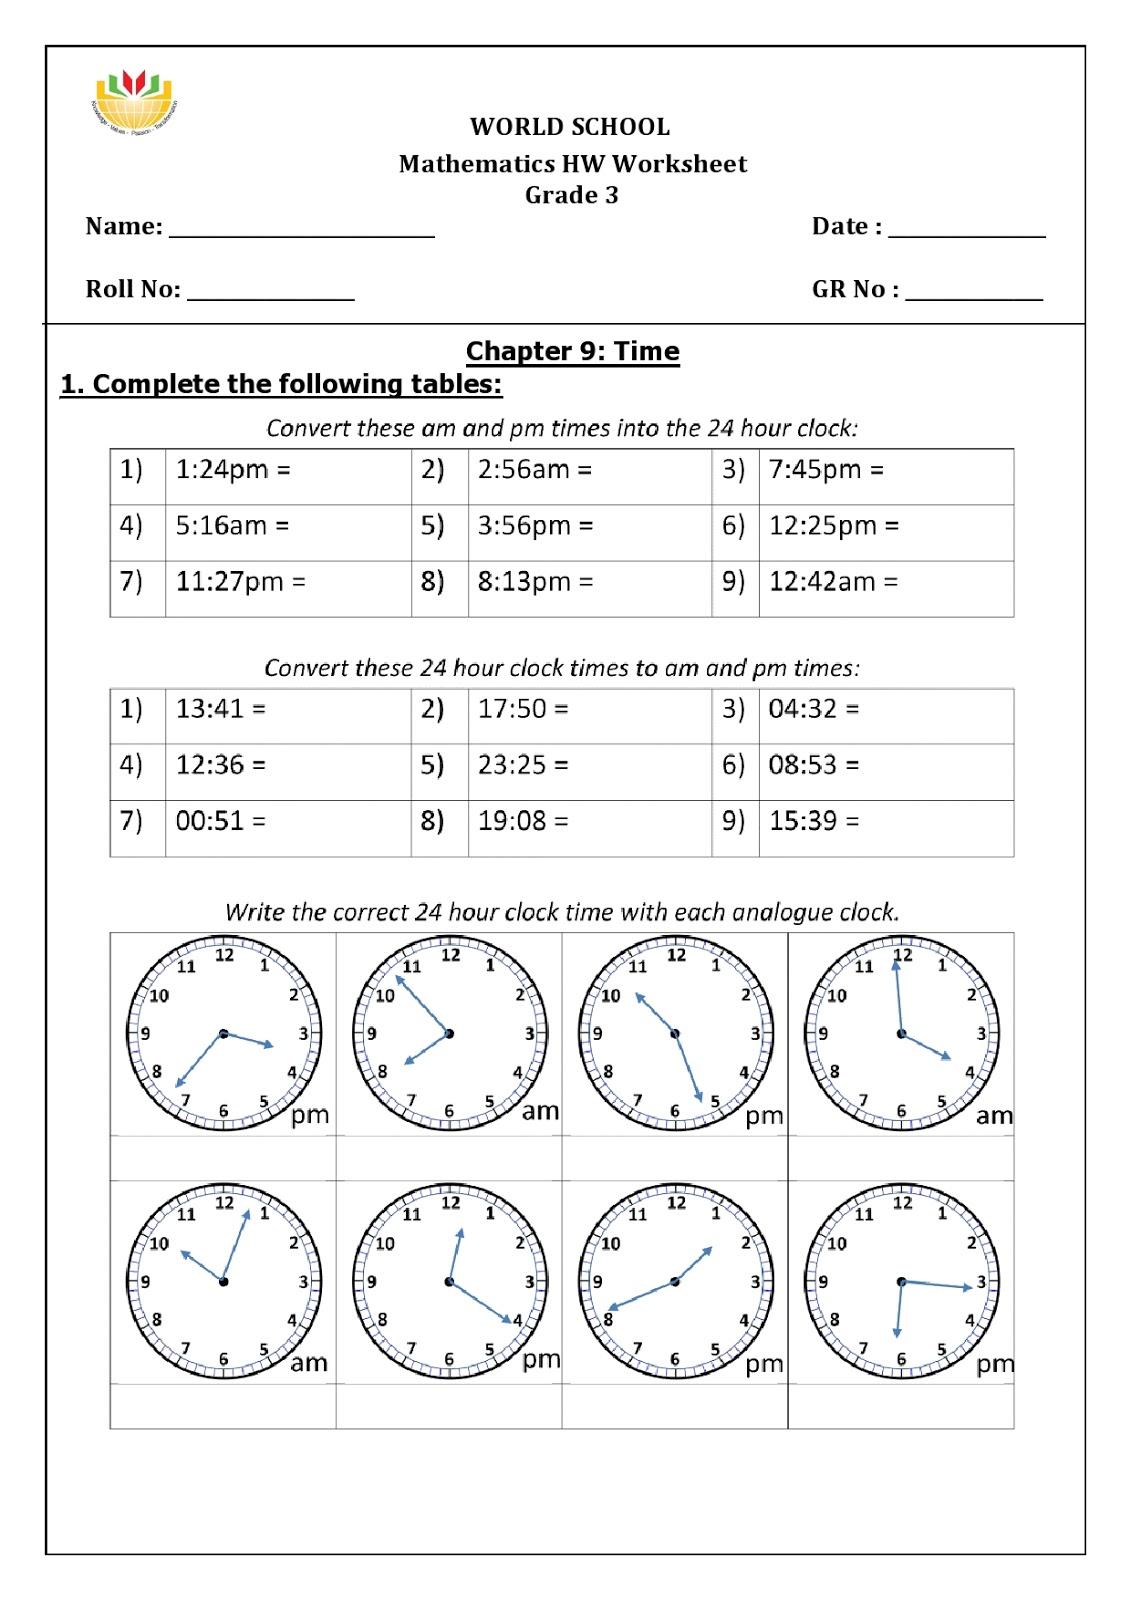 Birla World School Oman Homework For Grade 3 As On 16 01